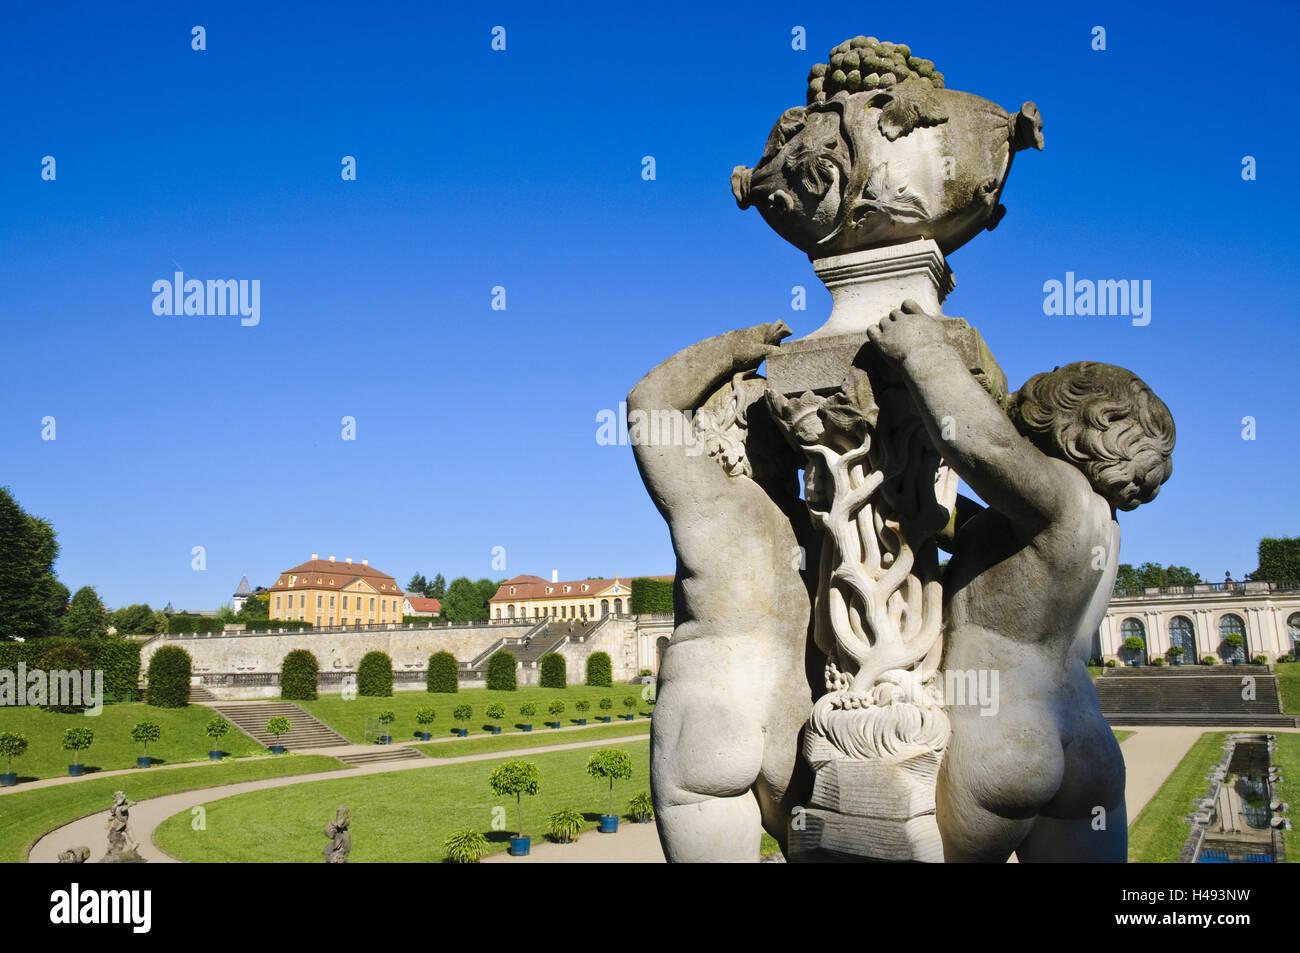 Baroque garden Großsedlitz, Saxony, Germany, - Stock Image